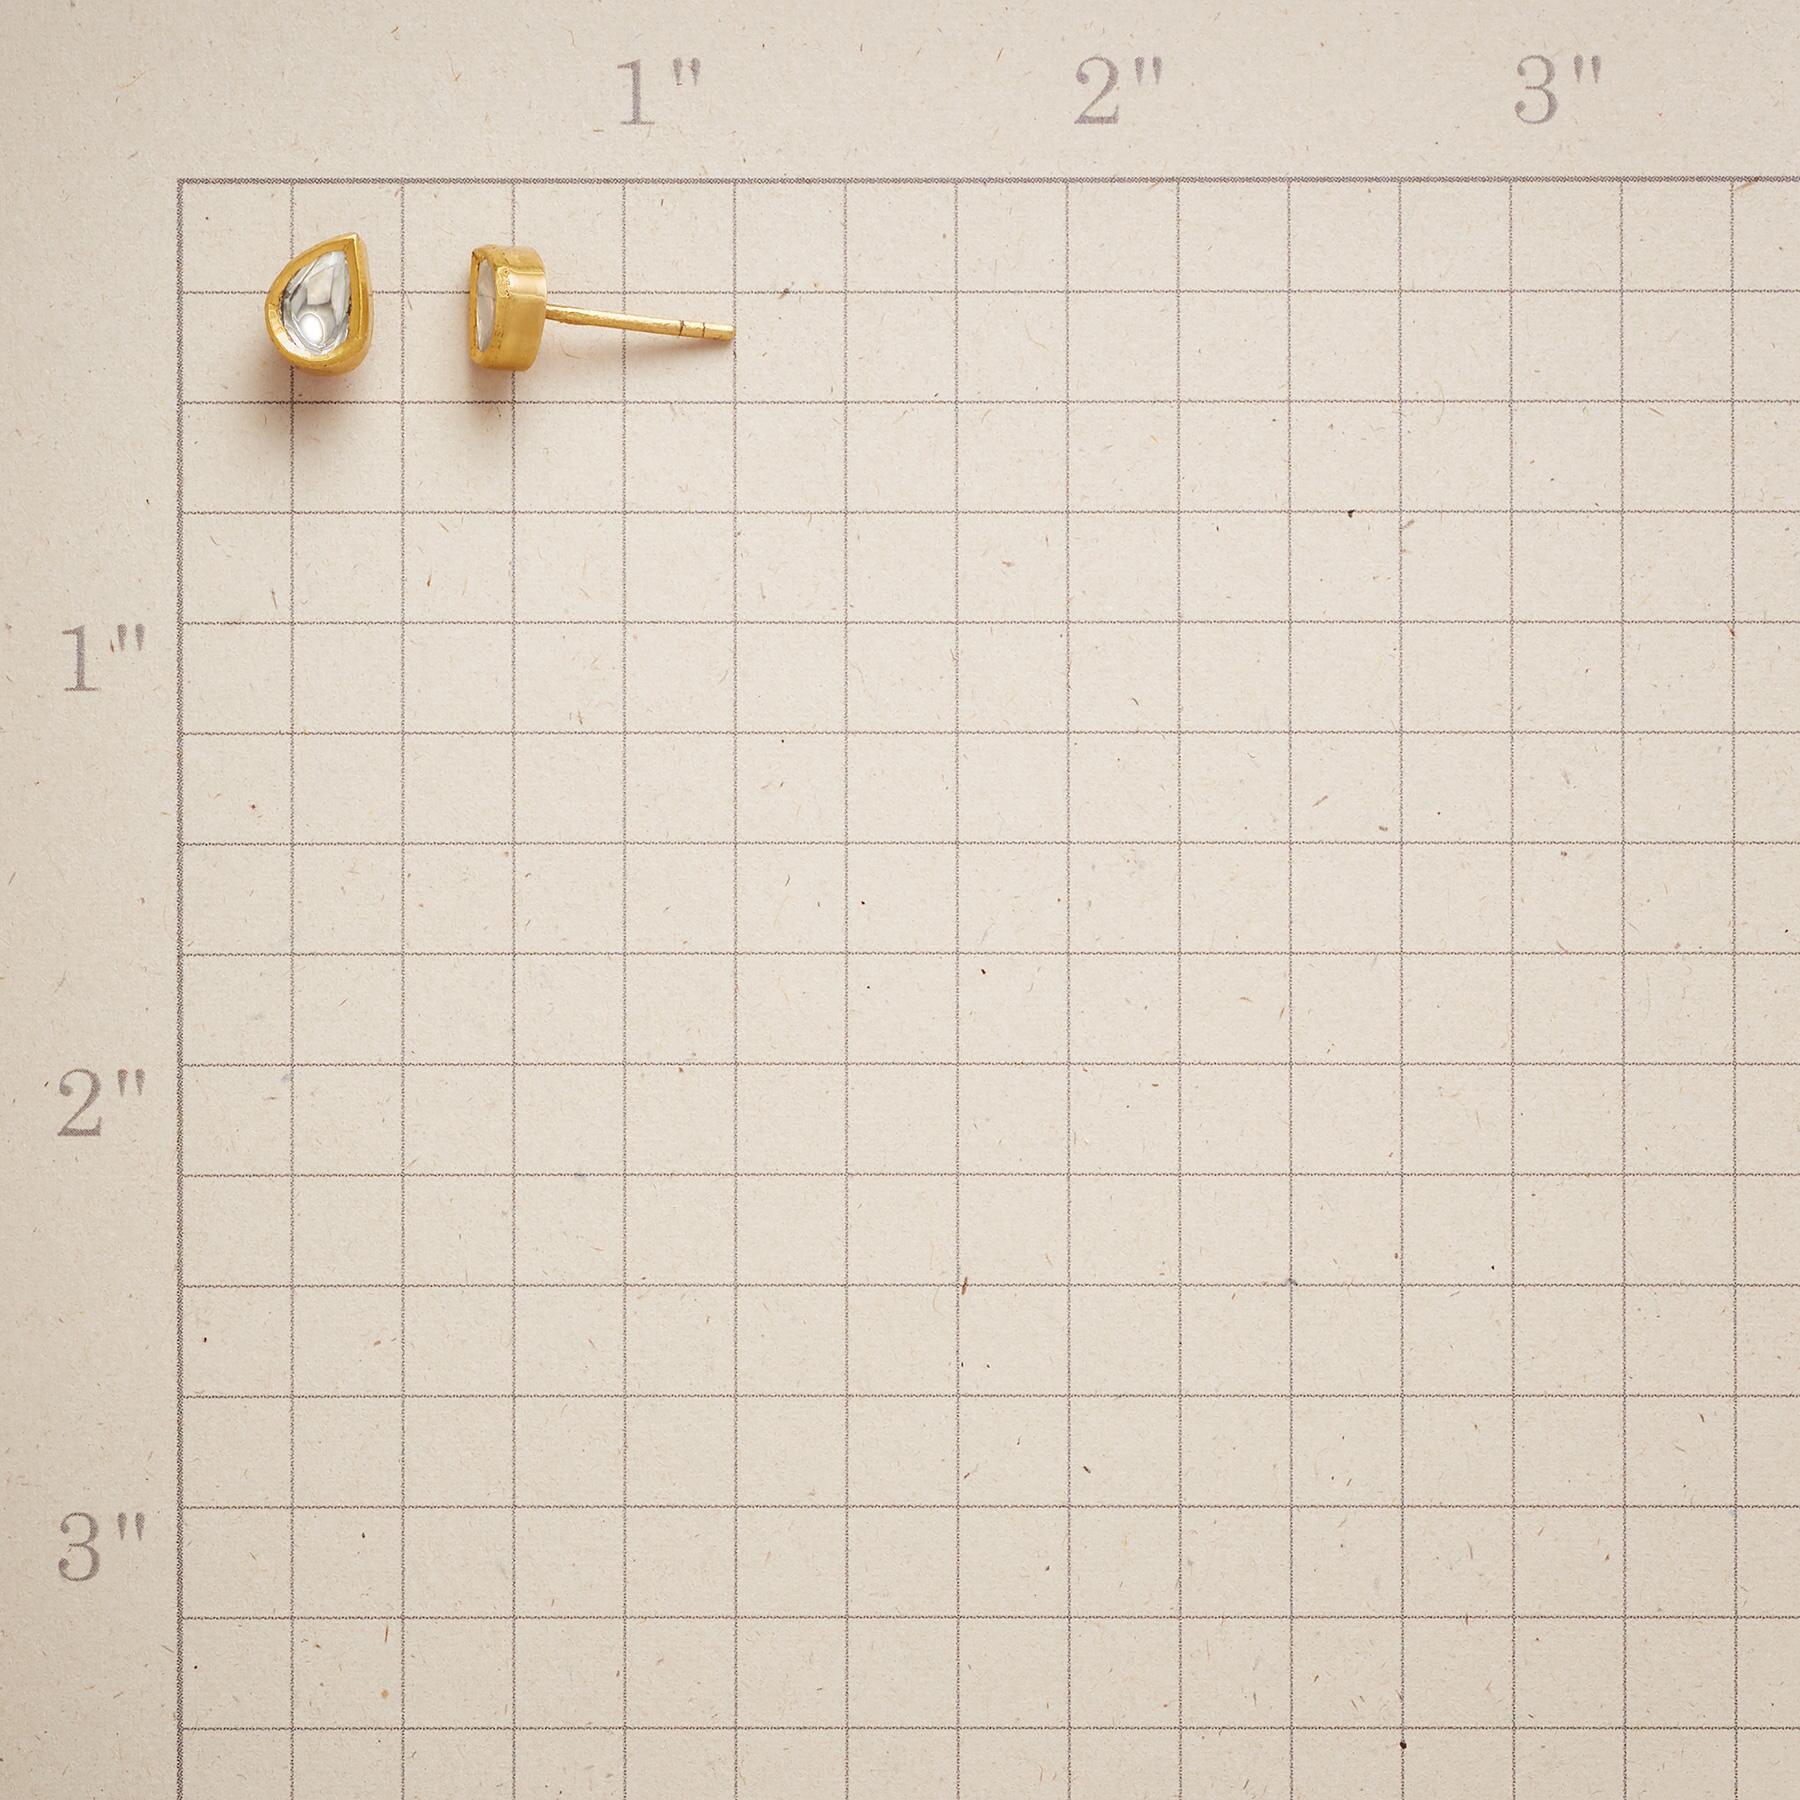 POLKI DIAMOND DEWDROP EARRINGS: View 2